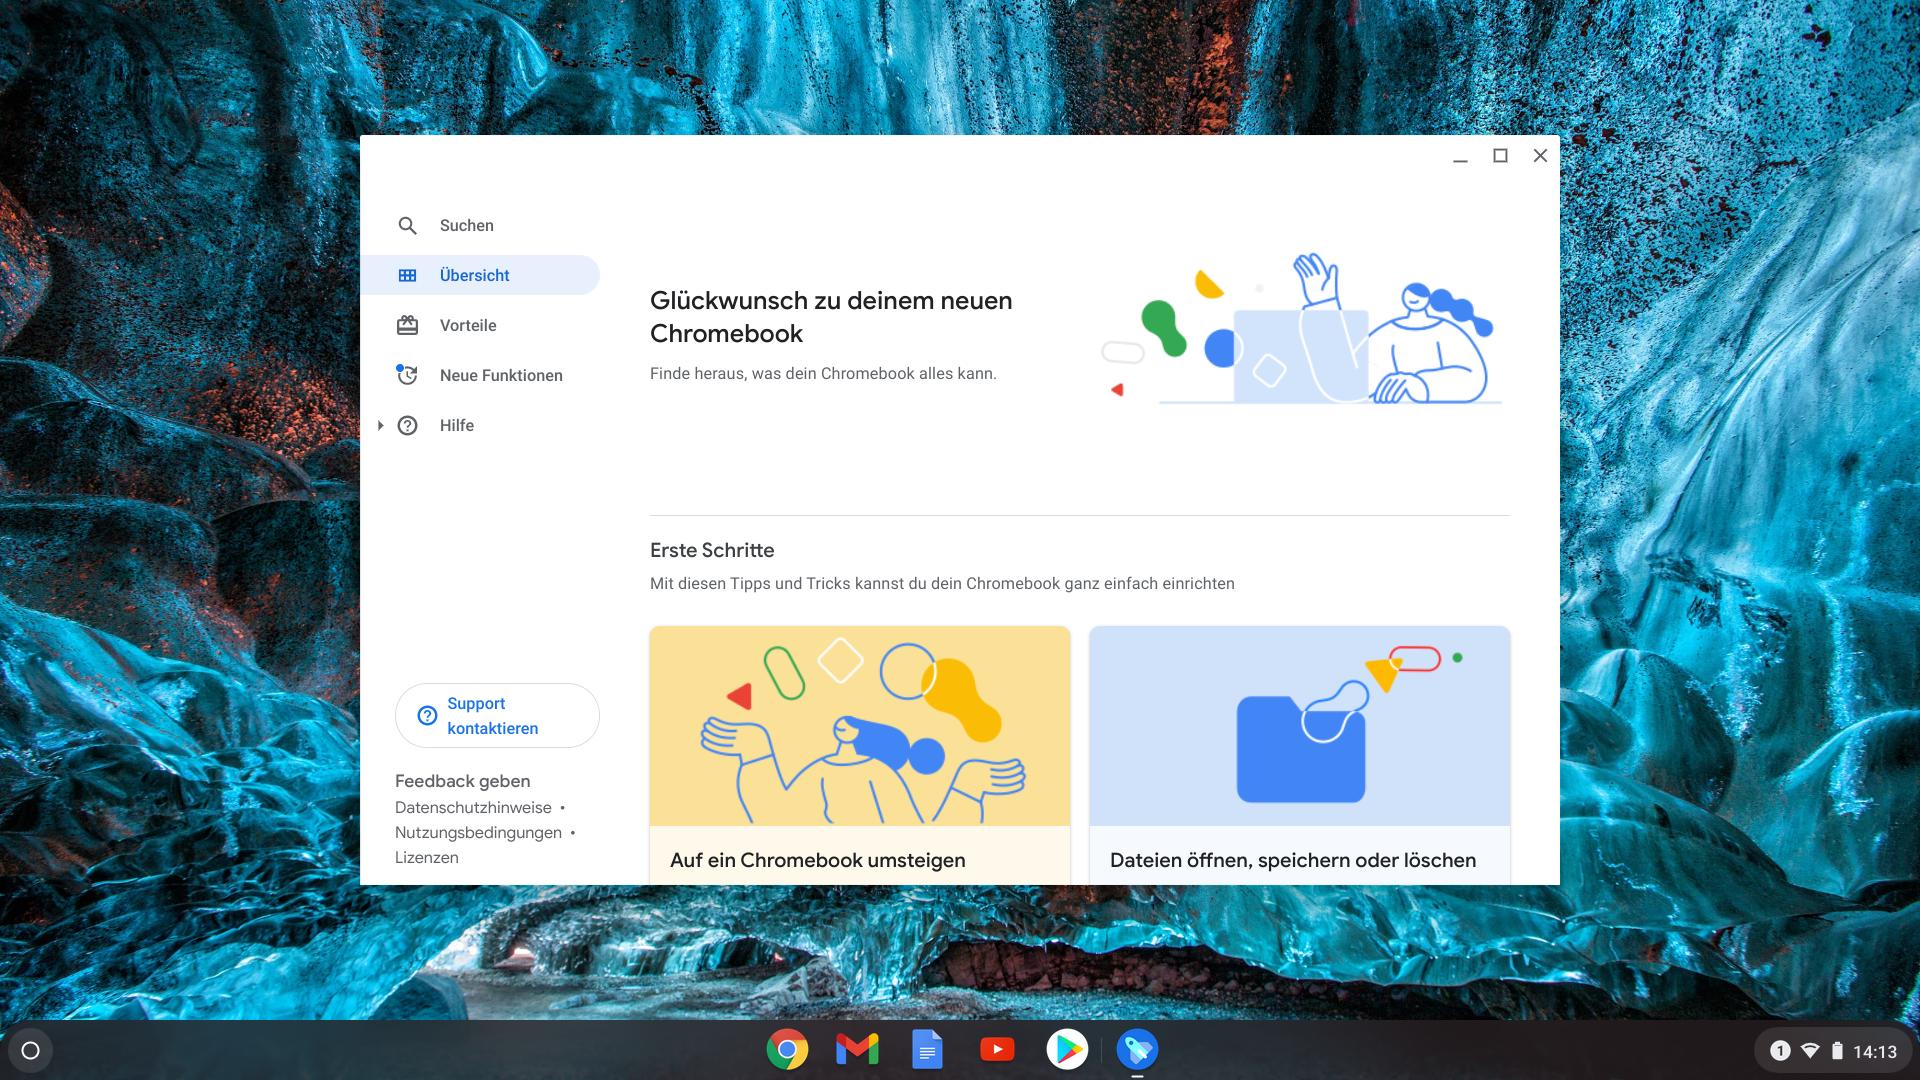 Chrome OS: Erste Schritte im Google-Betriebssystem